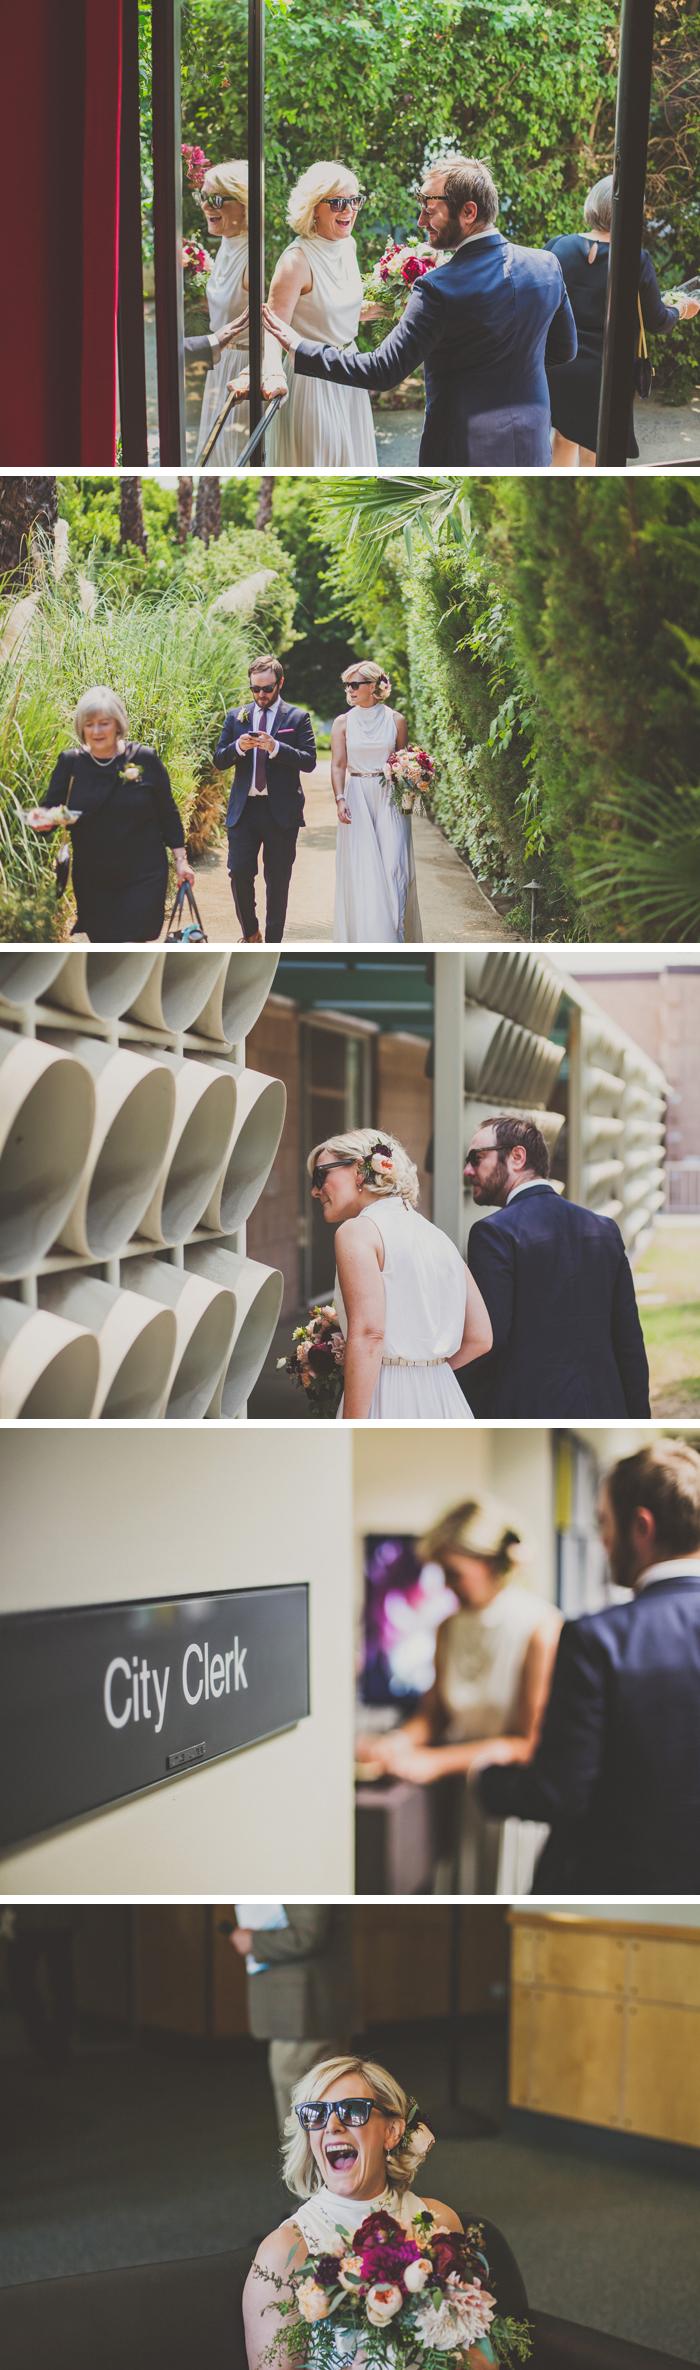 Palm Springs City Hall Wedding Photos